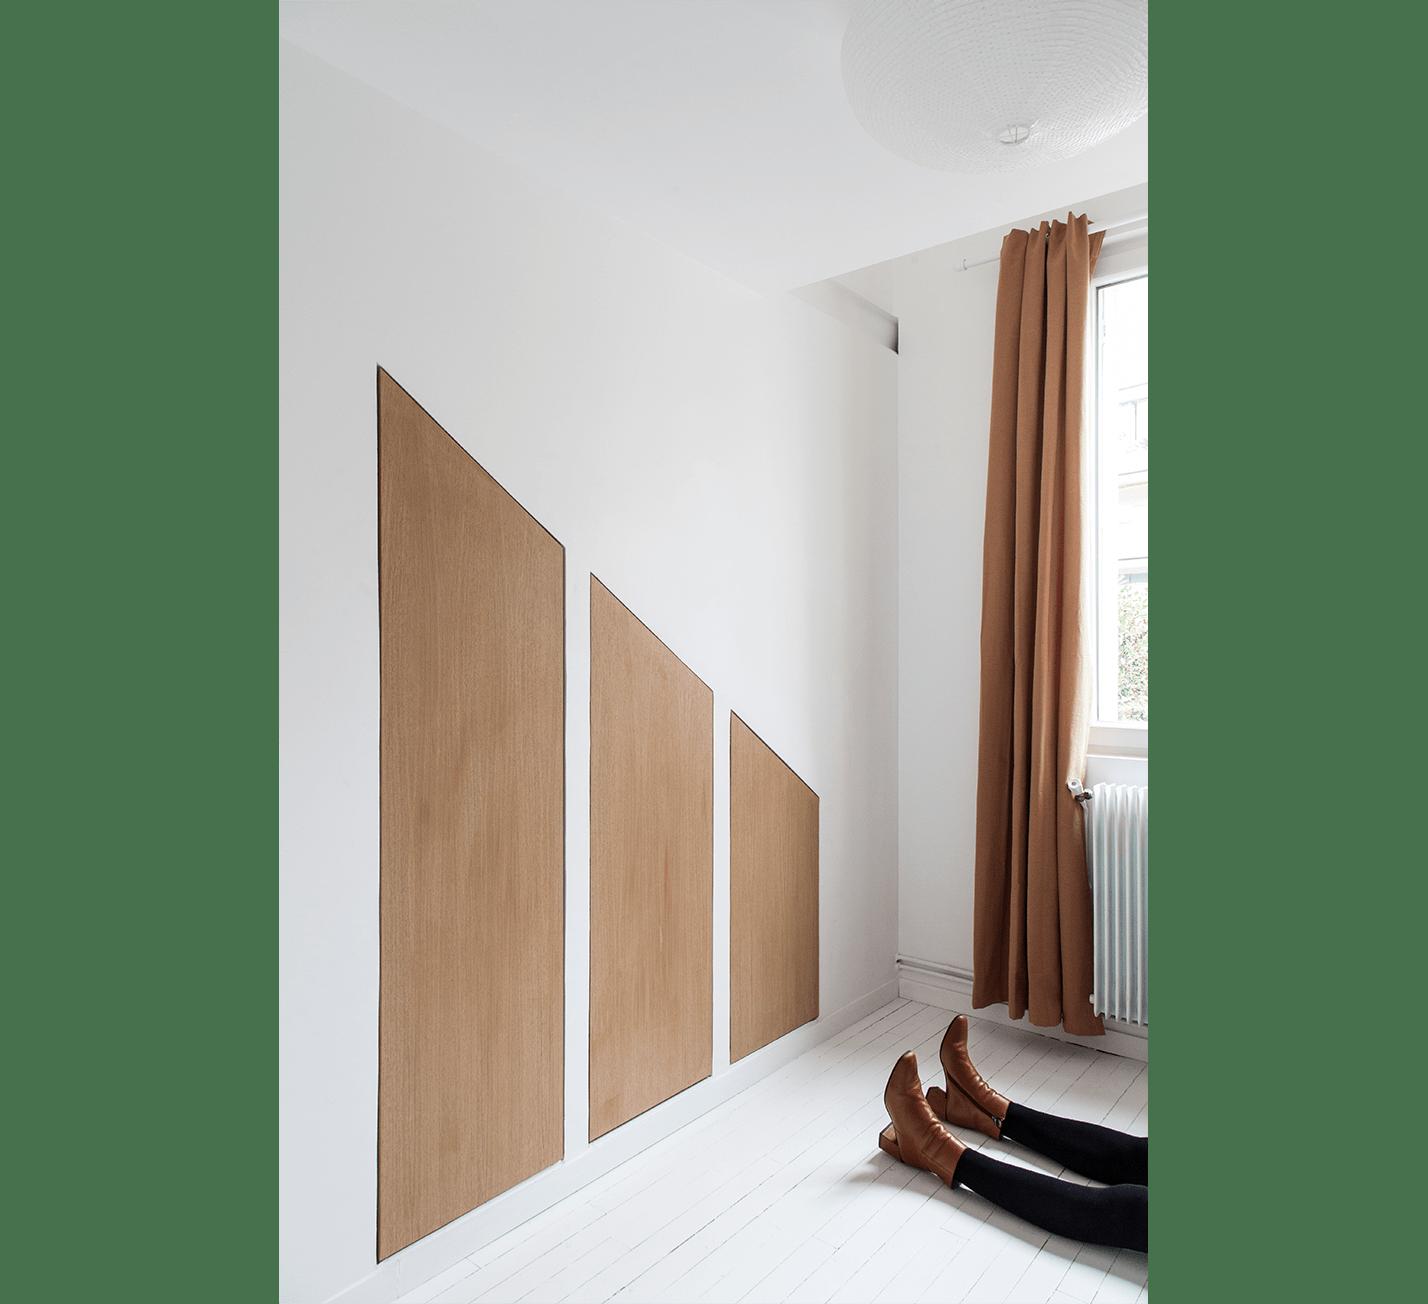 Projet-Germaine-Atelier-Steve-Pauline-Borgia-Architecte-interieur-07-min